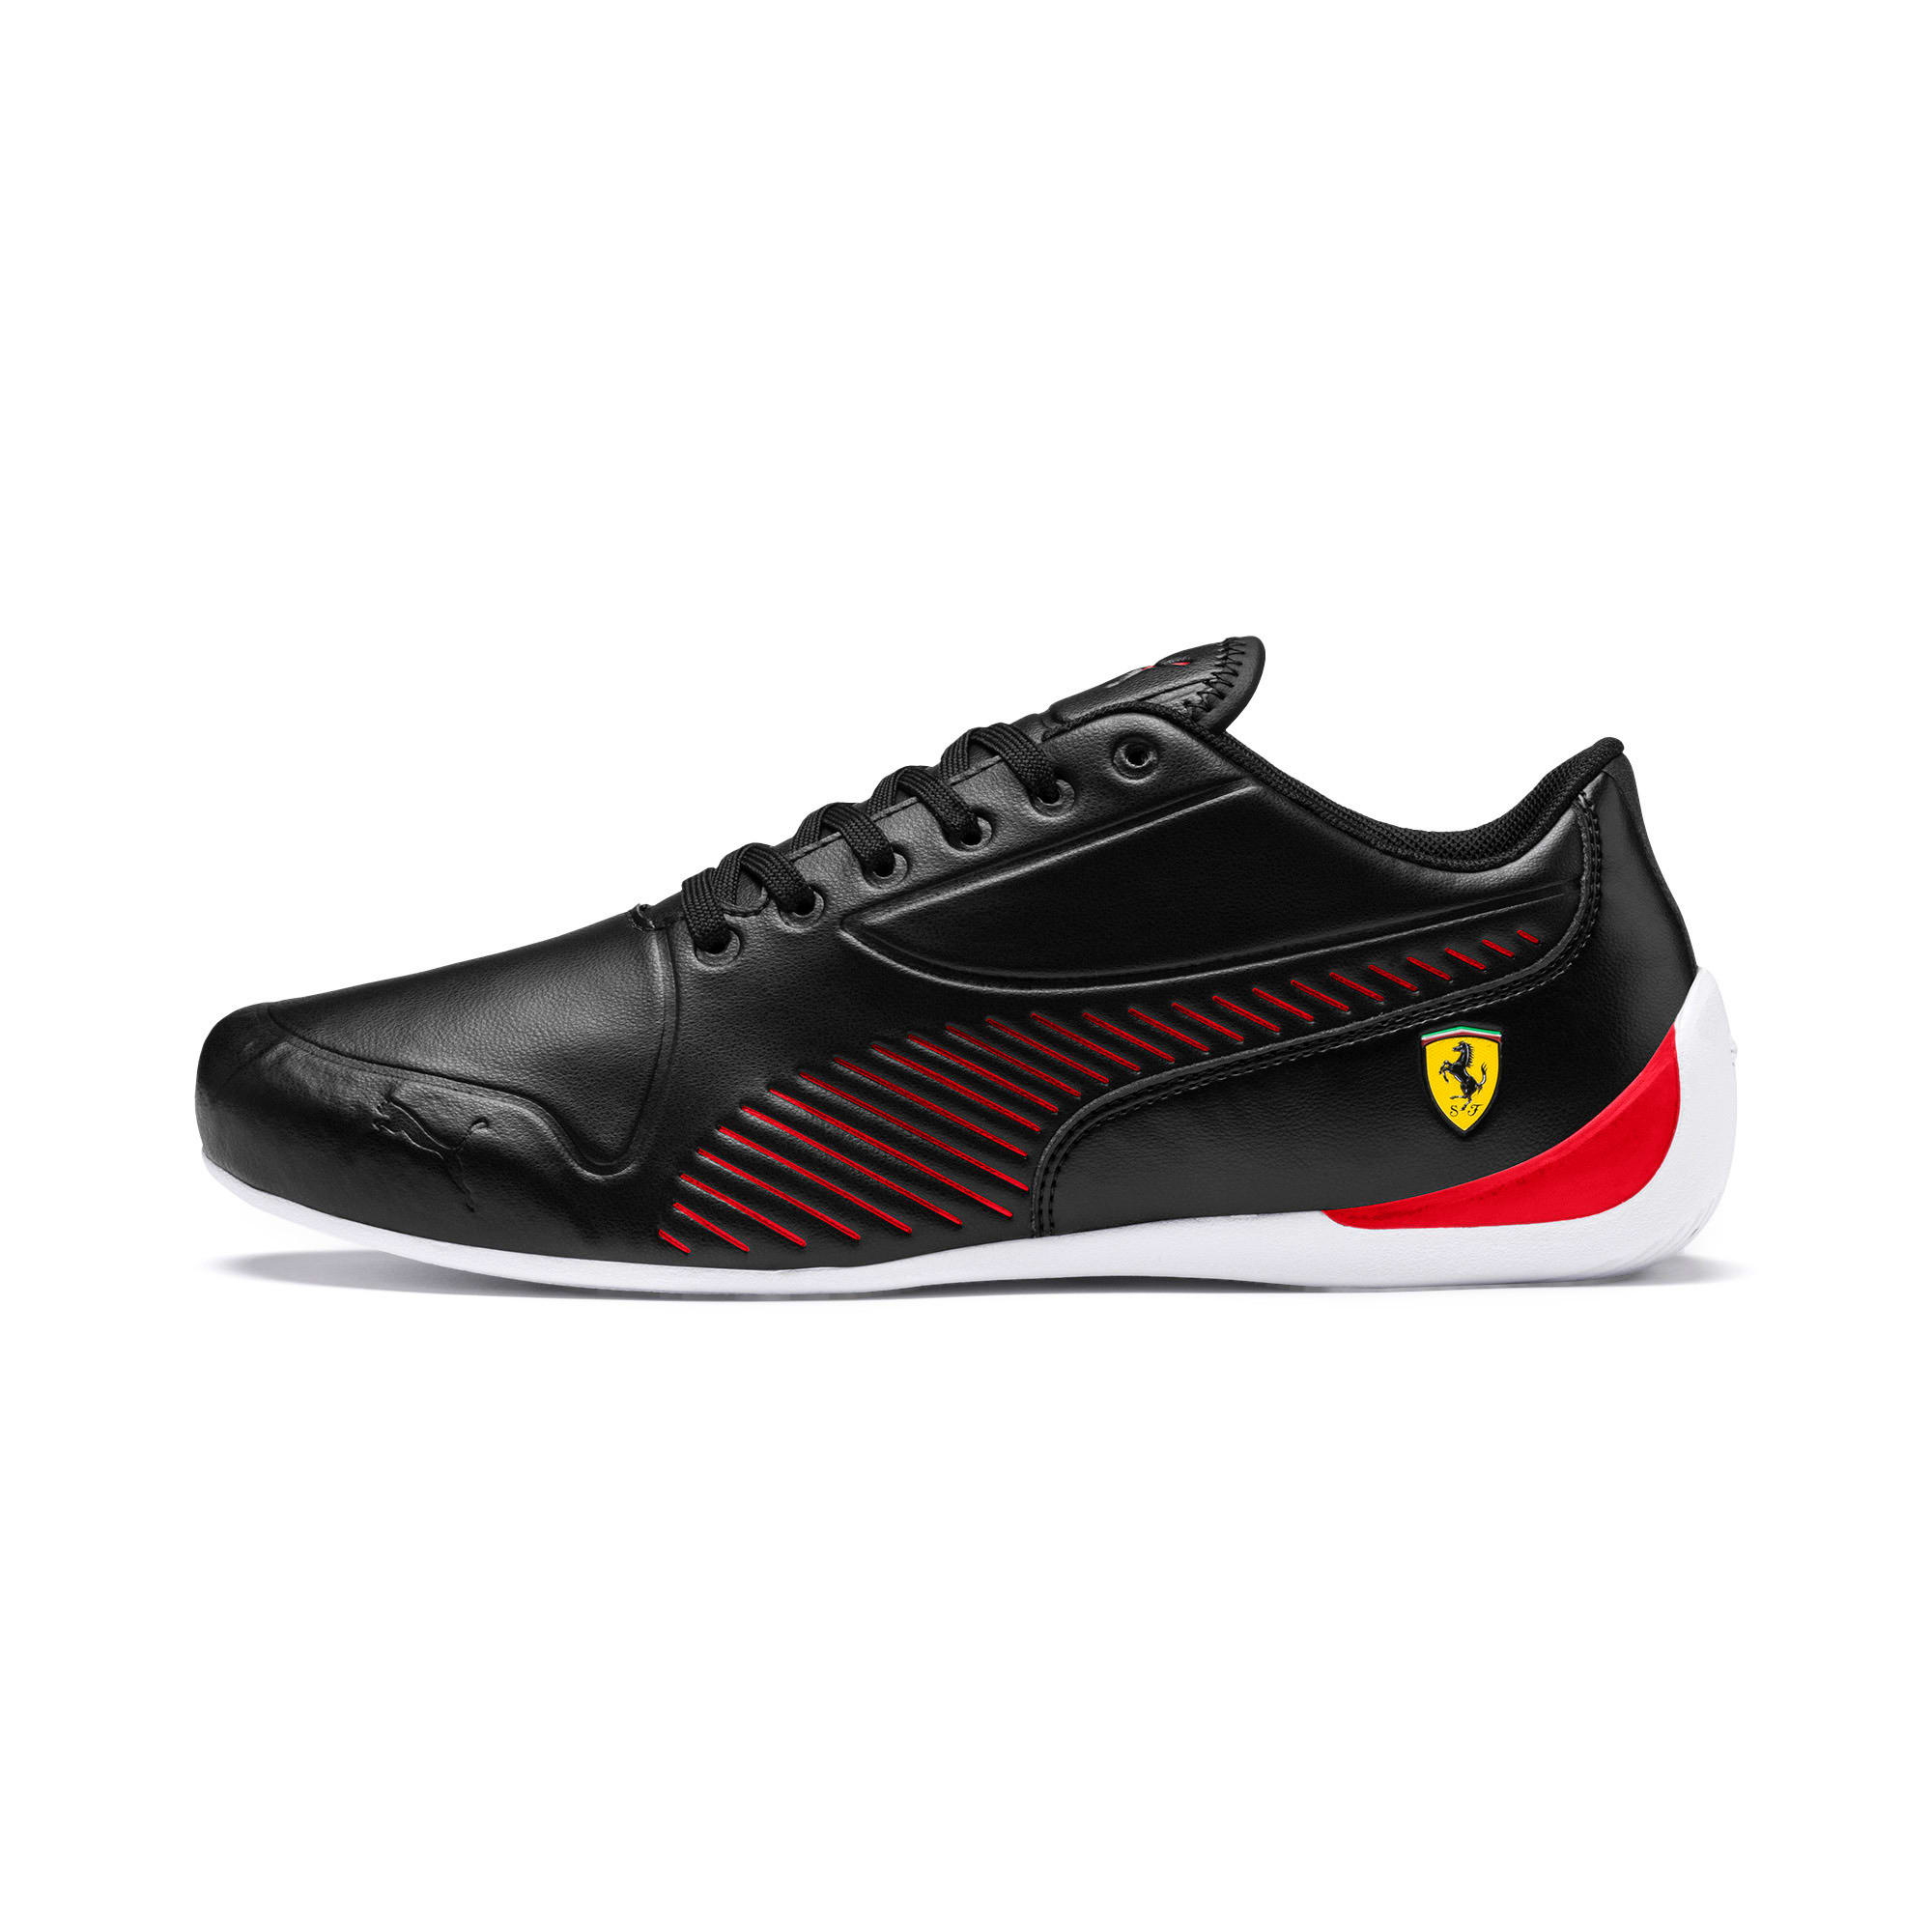 Miniatura 1 de Zapatos Scuderia Ferrari Drift Cat 7S Ultra para hombre, Puma Black-Rosso Corsa, mediano